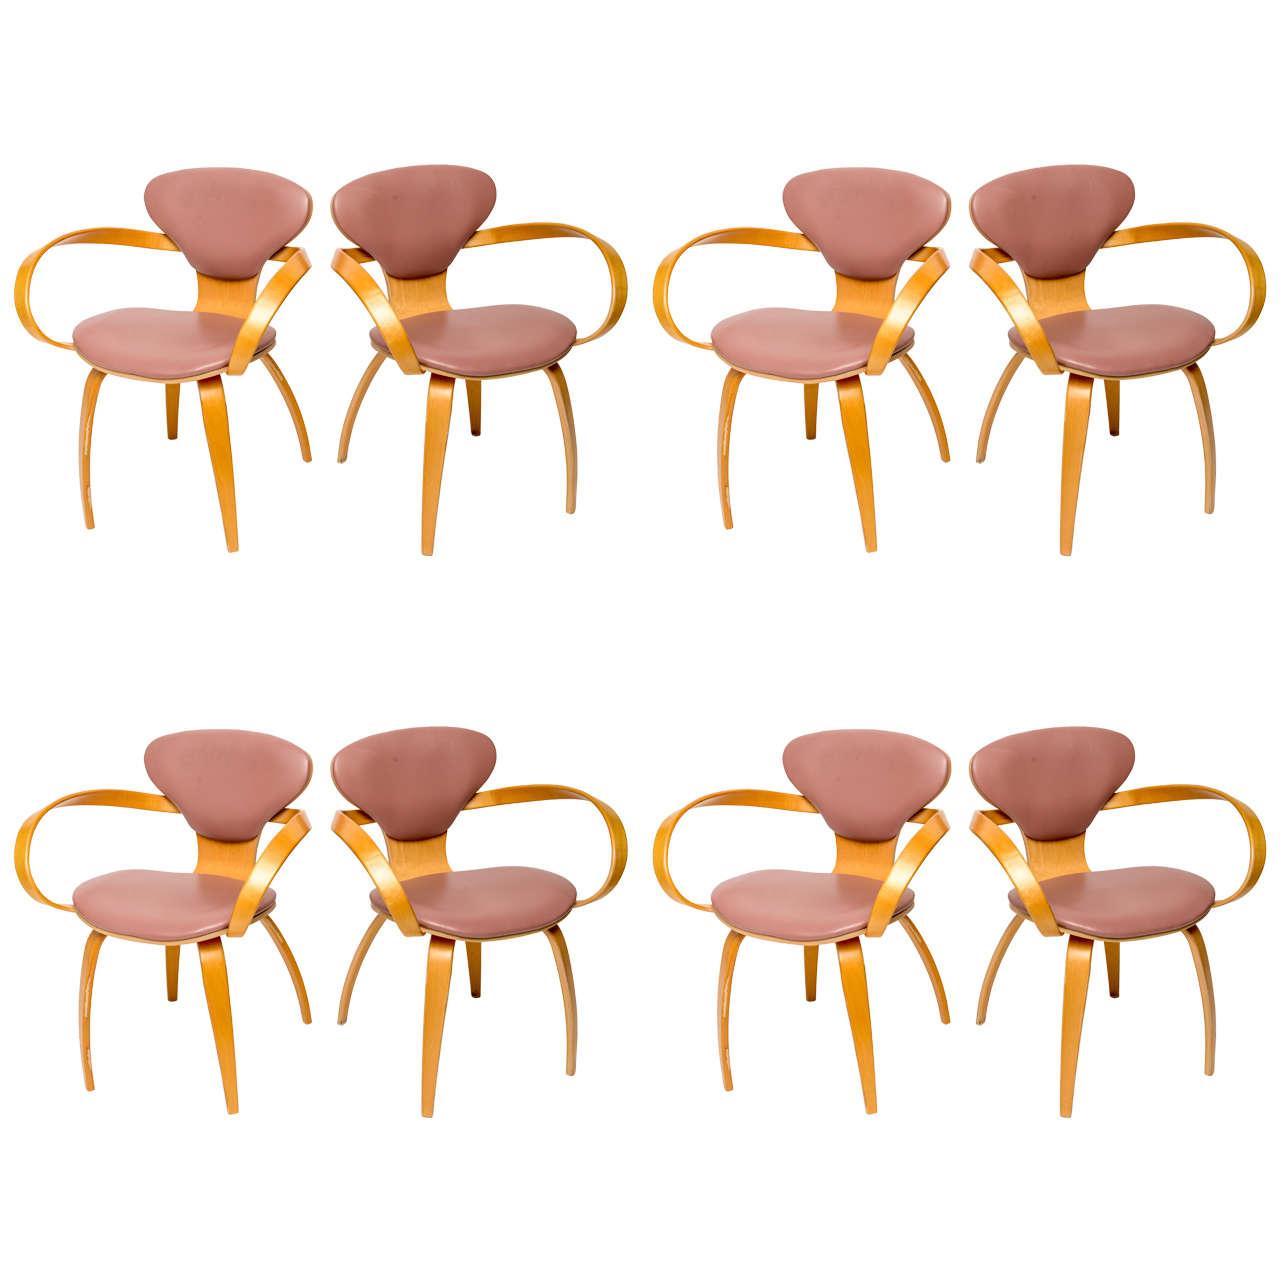 Normal Cherner Pretzel Chairs for Plycraft For Sale